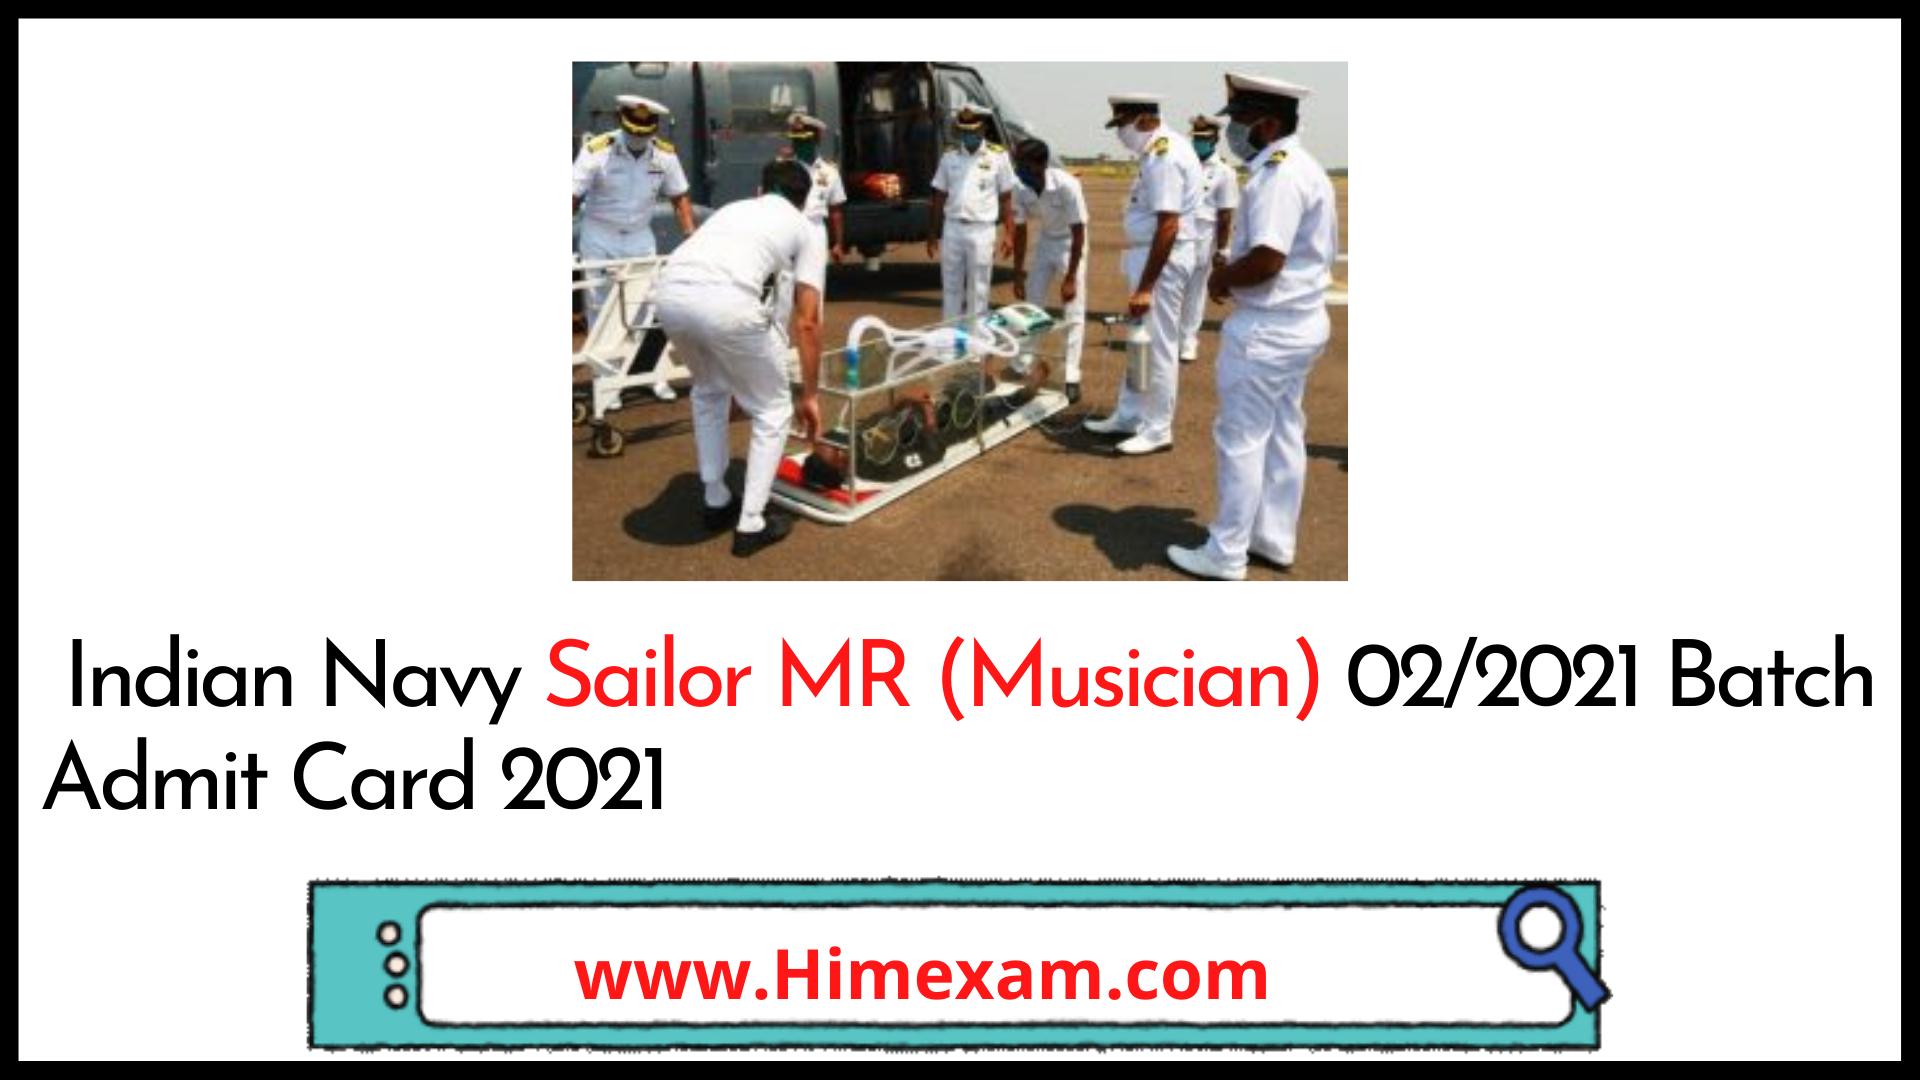 Indian Navy Sailor MR (Musician) 02/2021 Batch Admit Card 2021